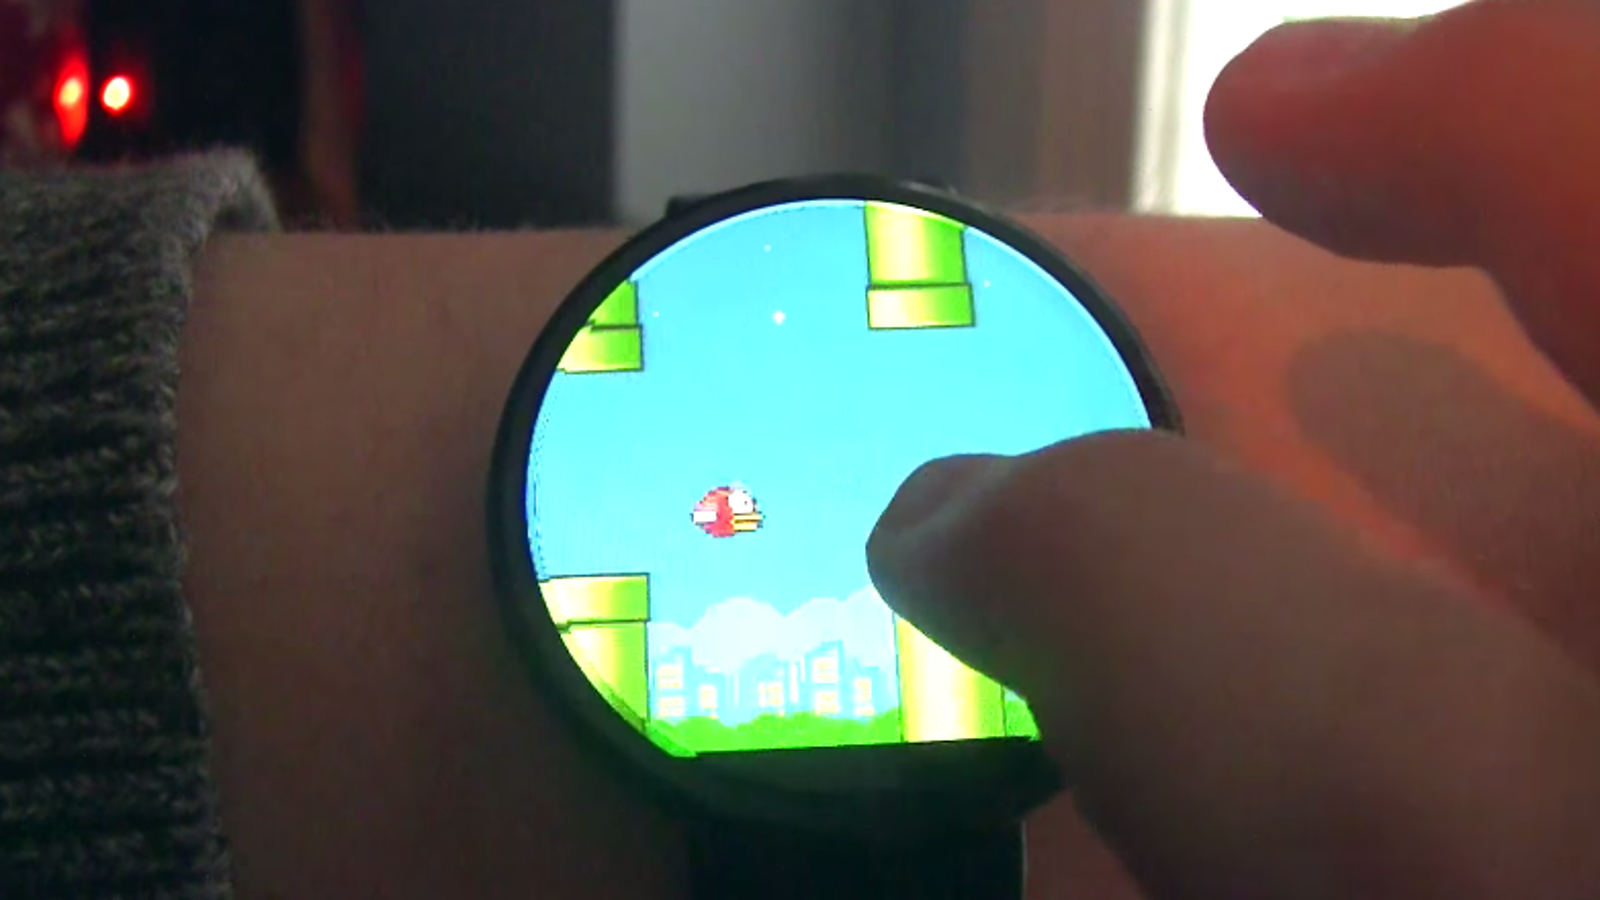 Era inevitable: ya puedes jugar a Flappy Bird en tu reloj Android Wear